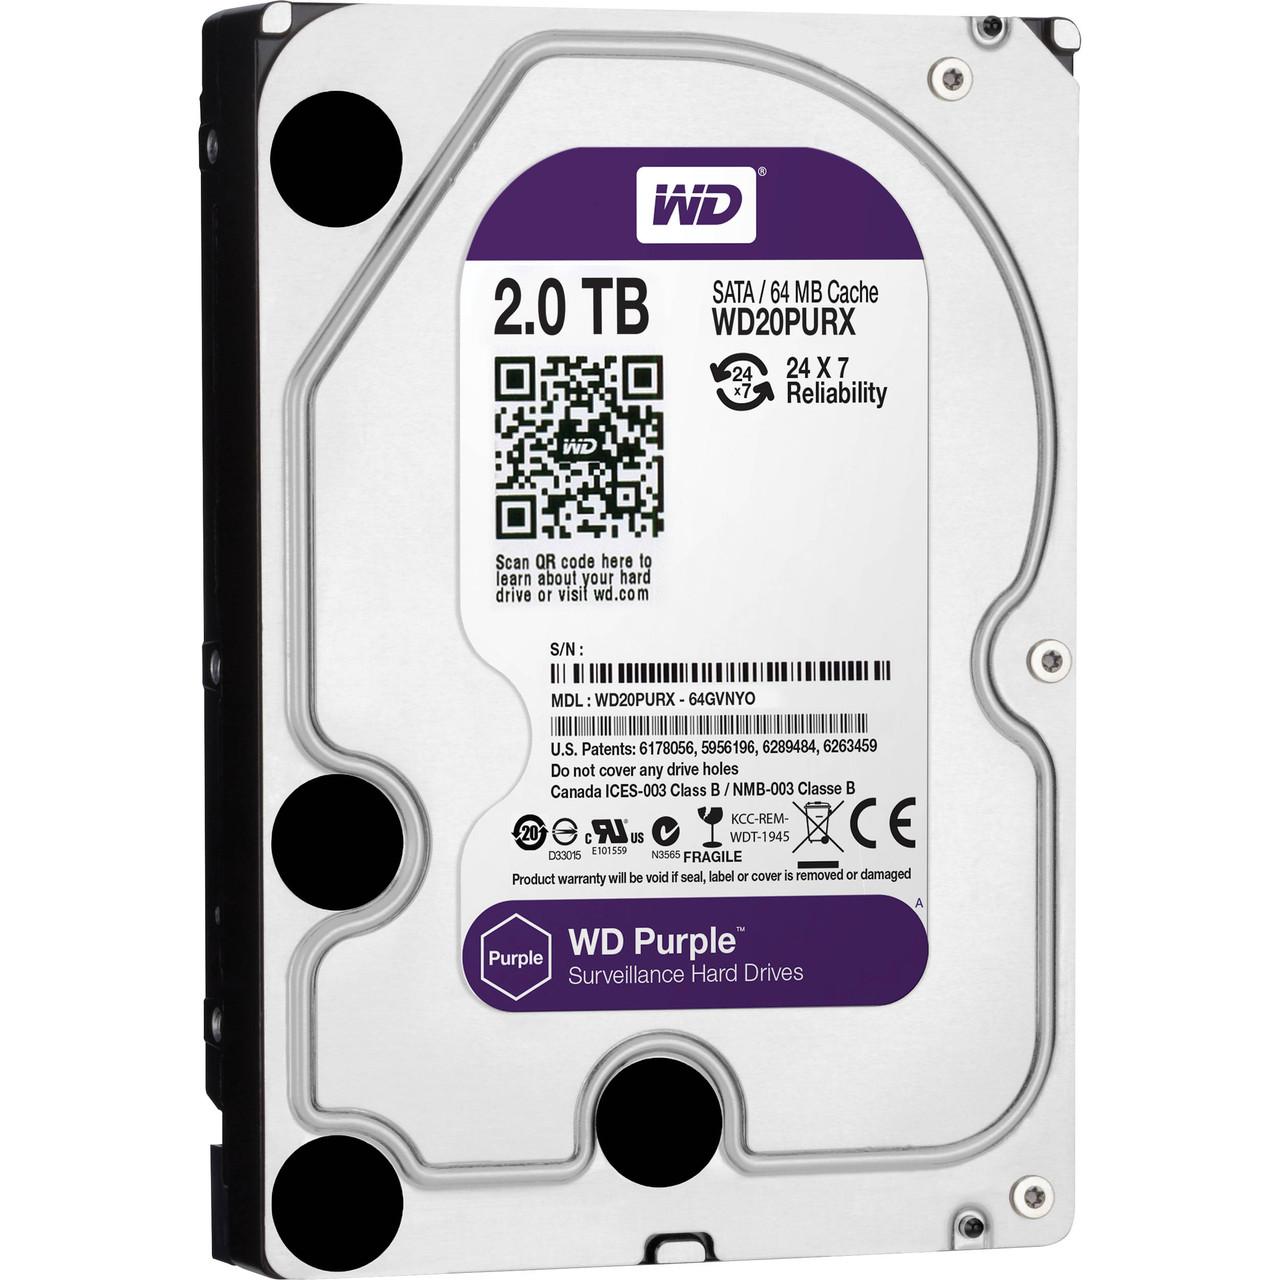 Жесткий диск для видеонаблюдения HDD 2 Tb Western Digital Purple WD20PURZ